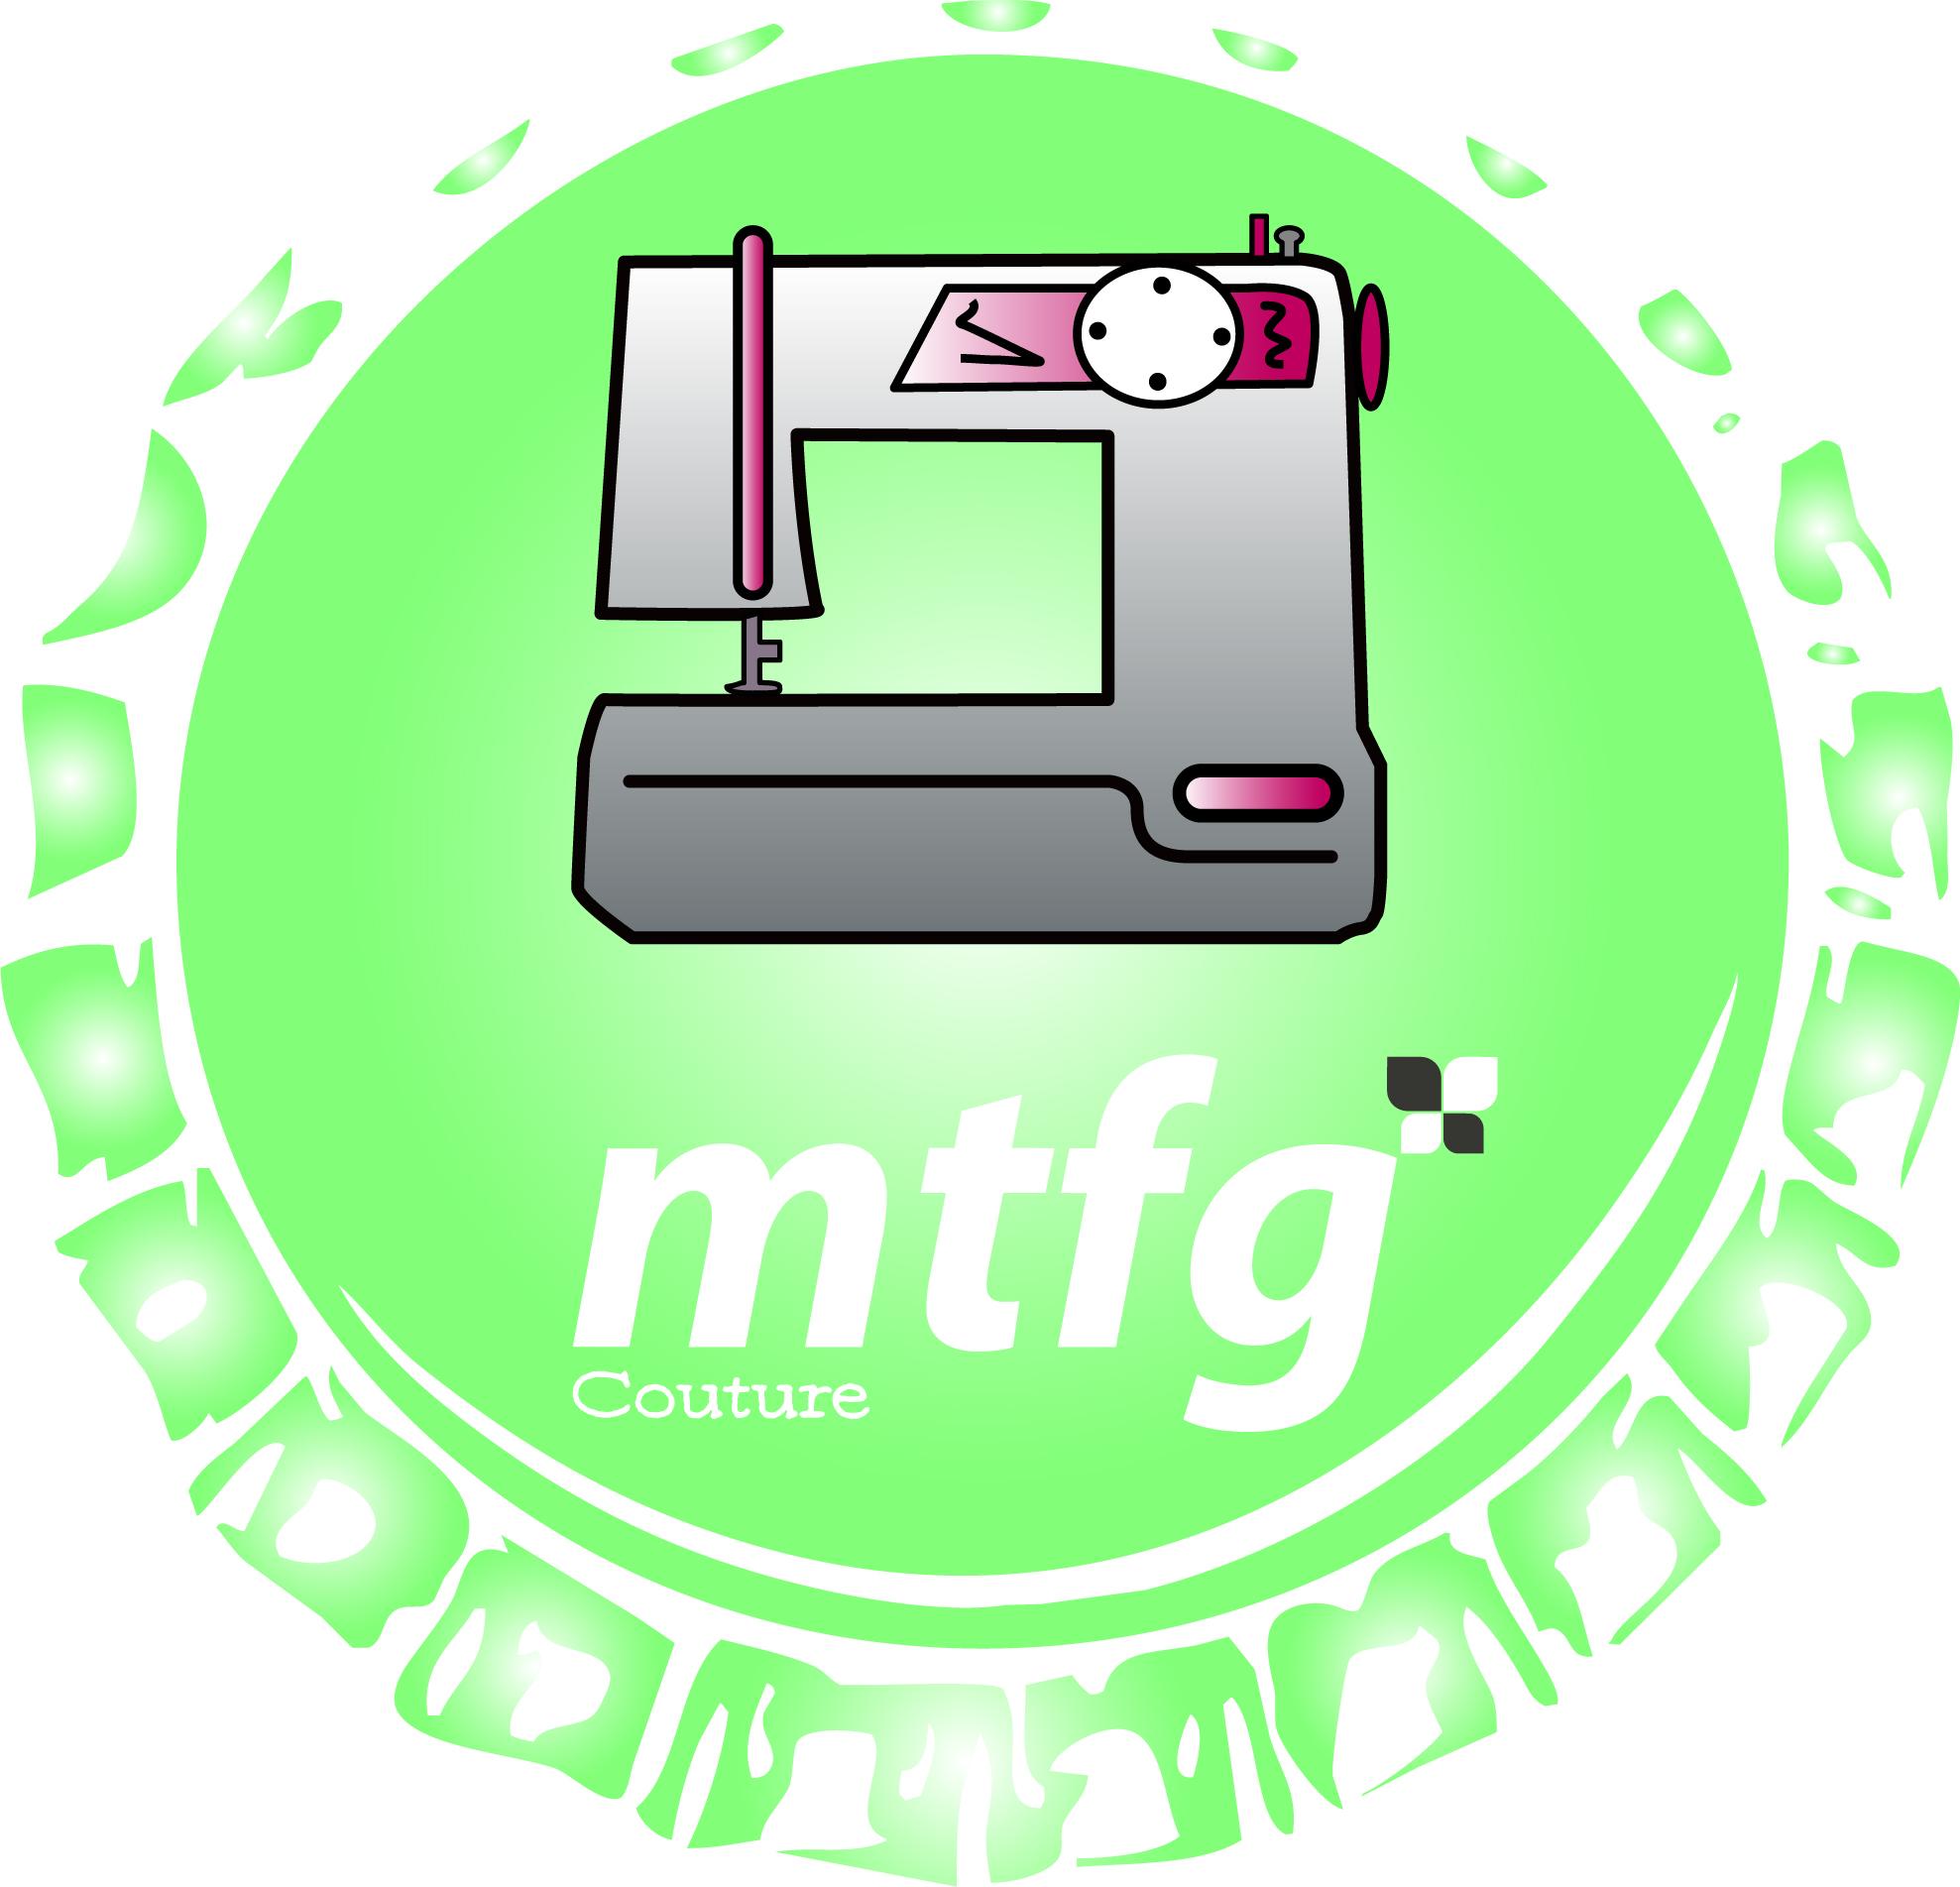 MTFG Couture